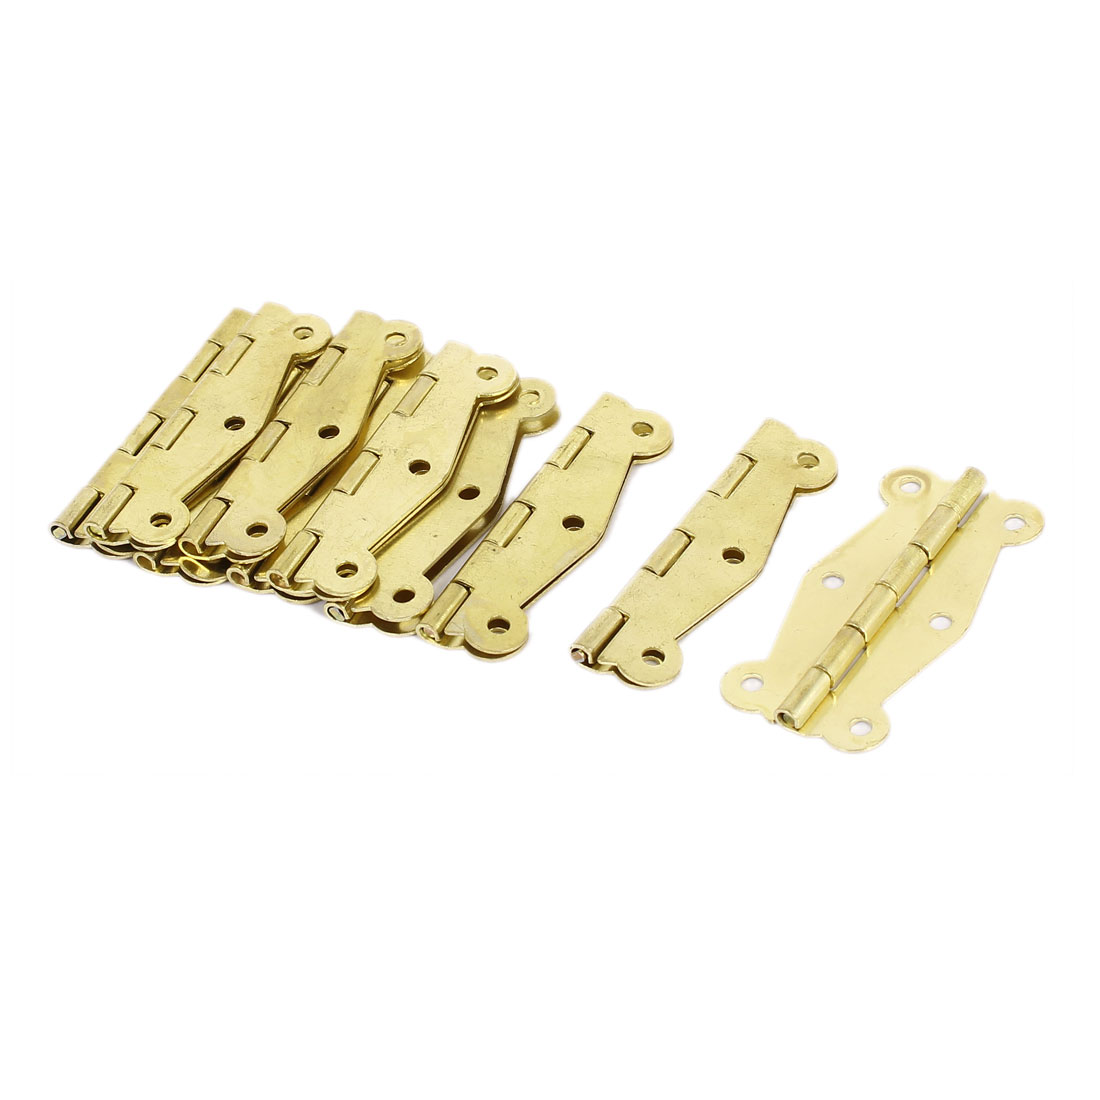 Closet Cabinet 6-Hole Door Hinge Gold Tone 51mm x 24mm 10PCS